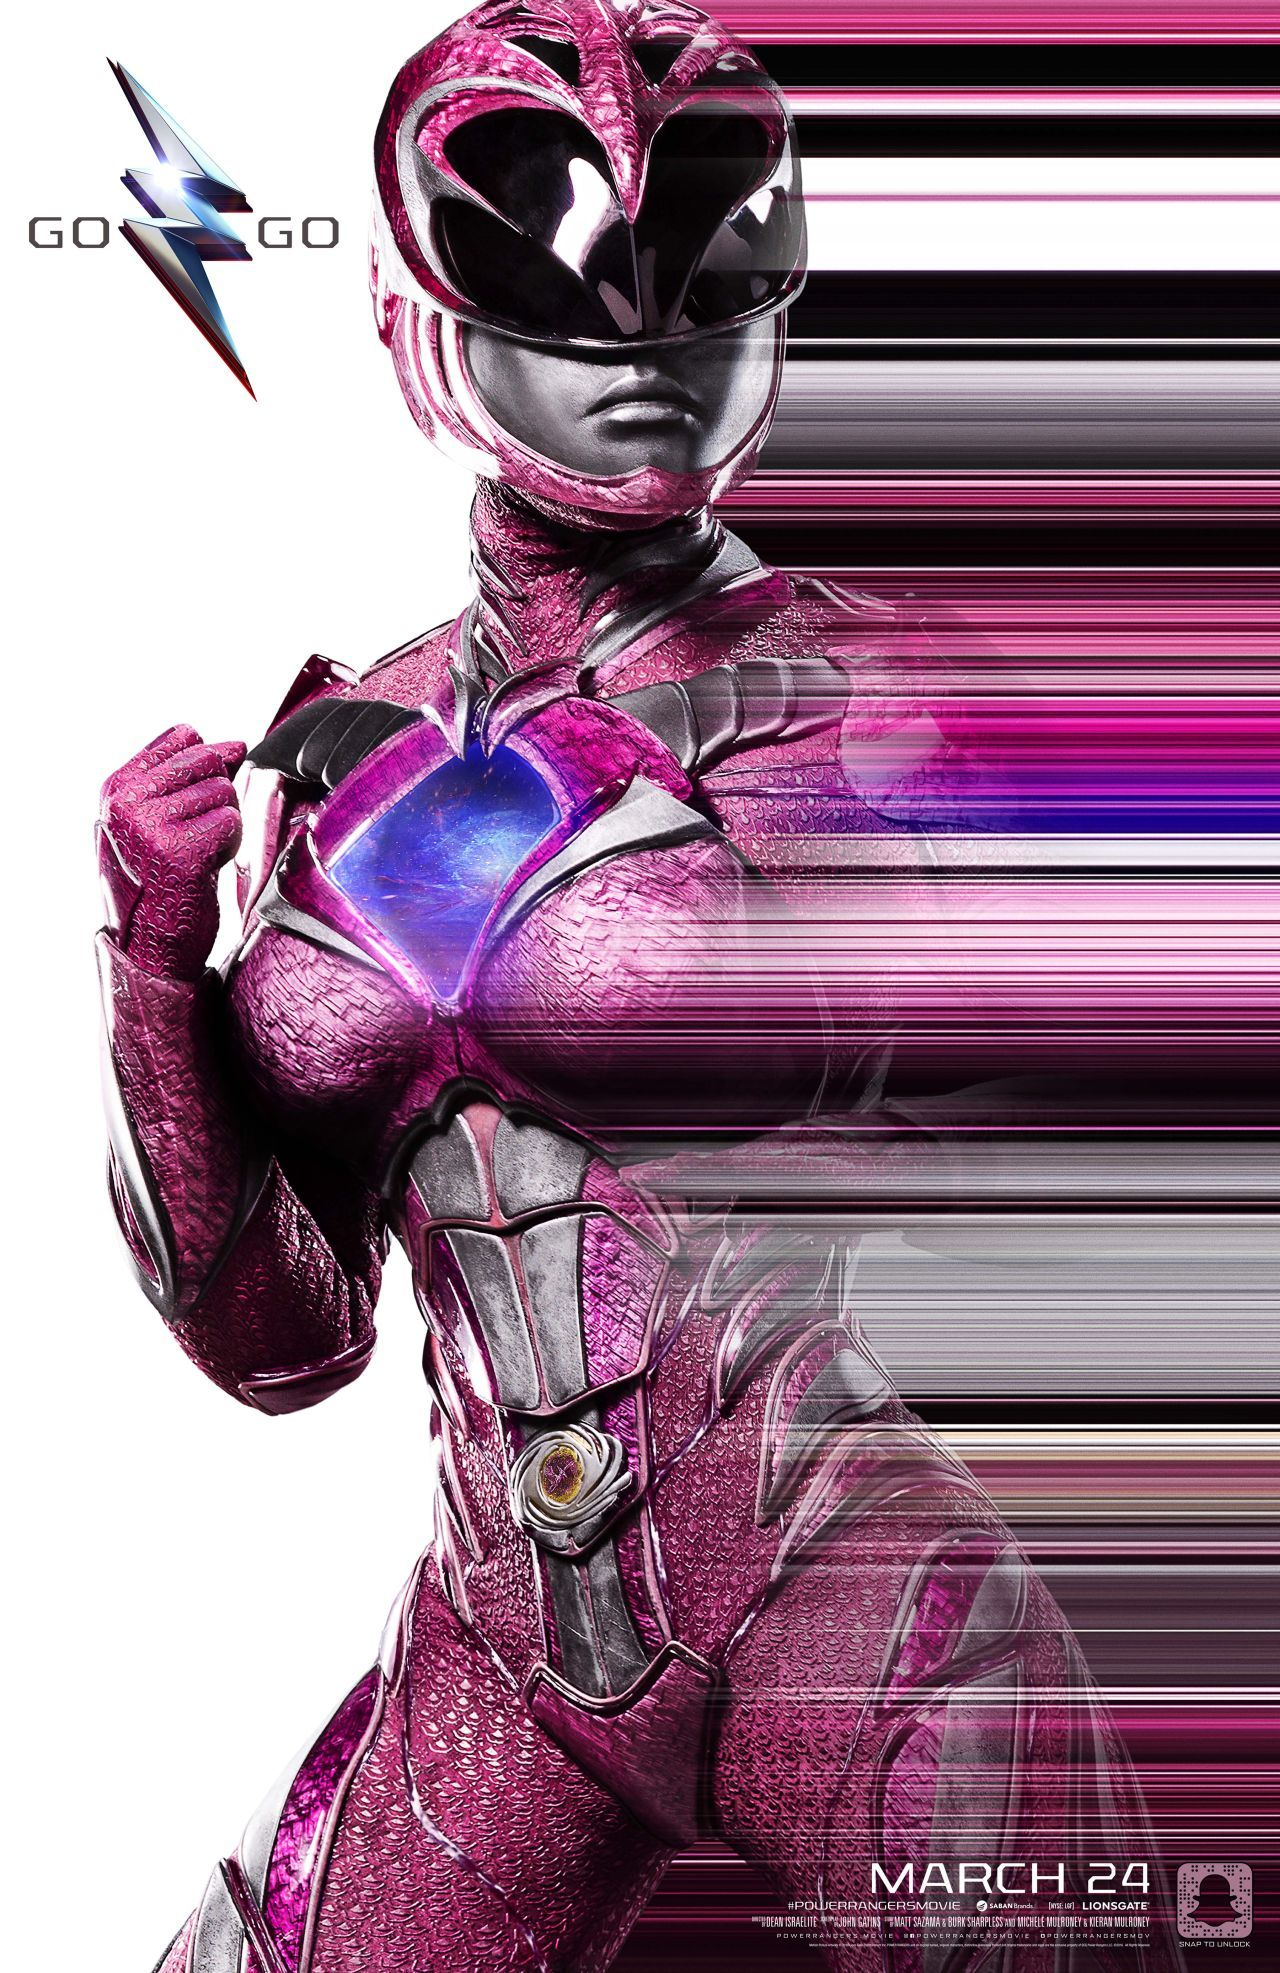 Power Rangers (2016) NYCC Poster - Pink Ranger